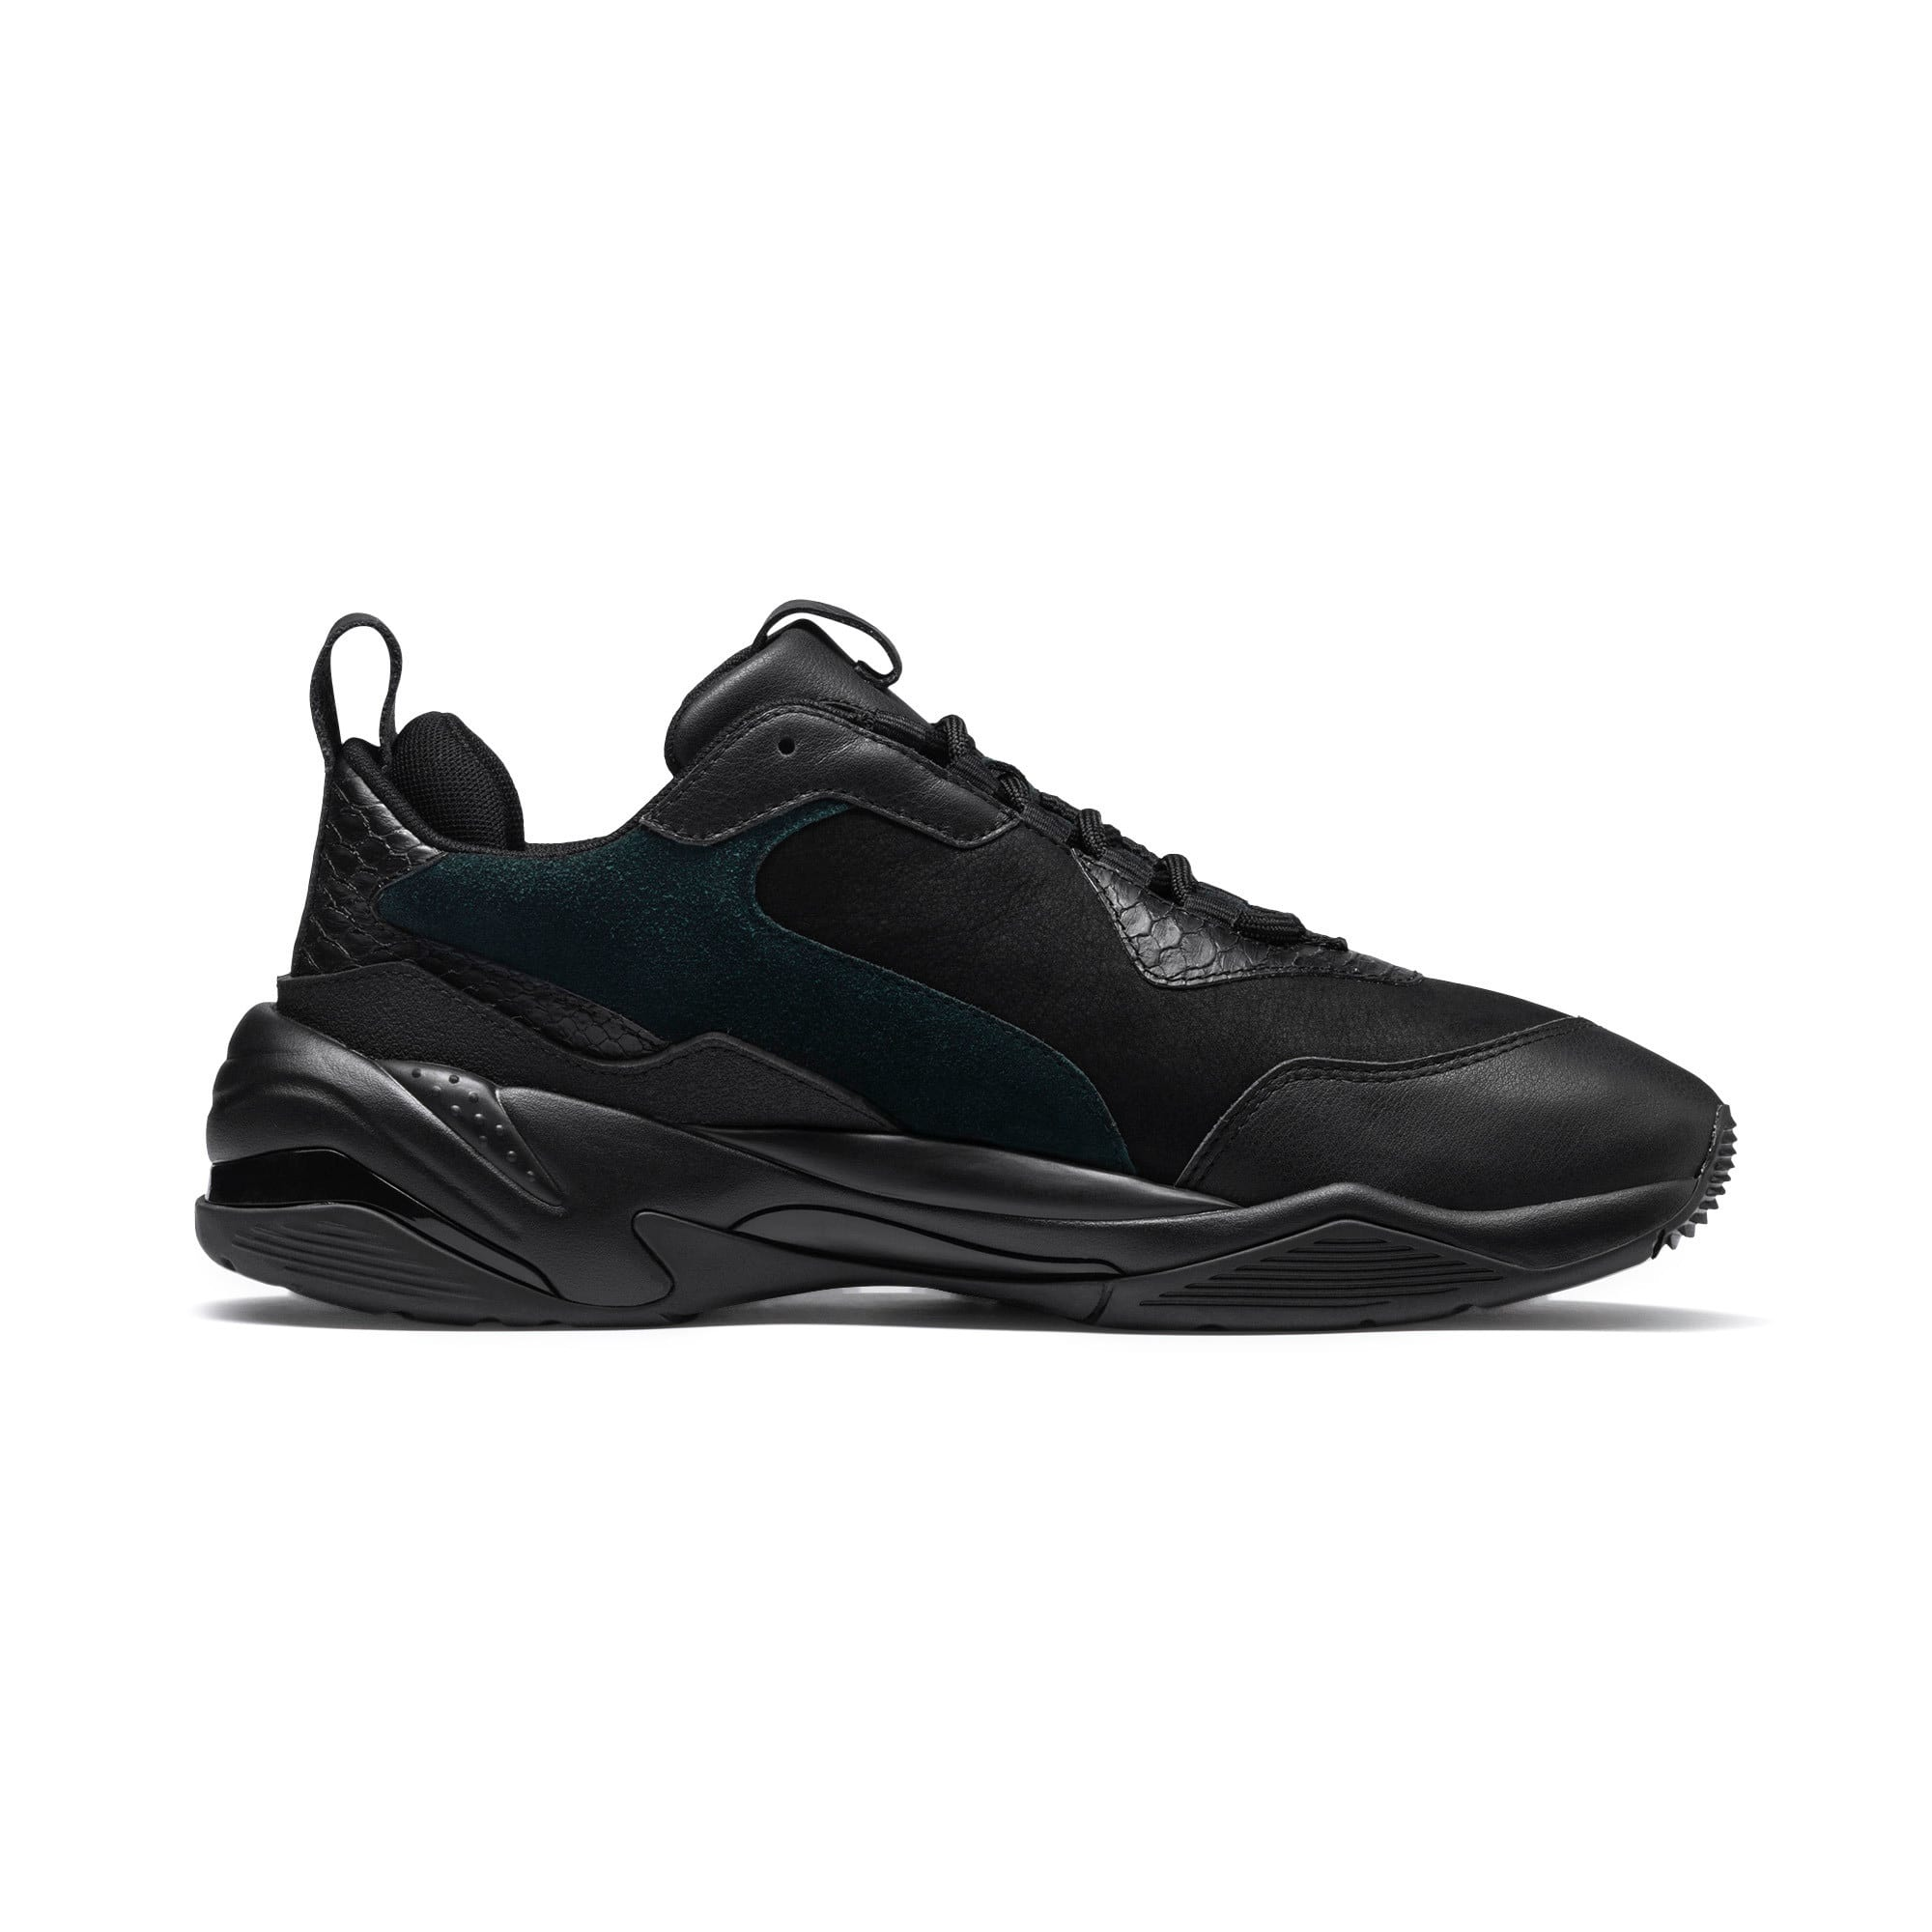 Thumbnail 5 of Thunder Desert Sneakers, Black-Puma Black-Black, medium